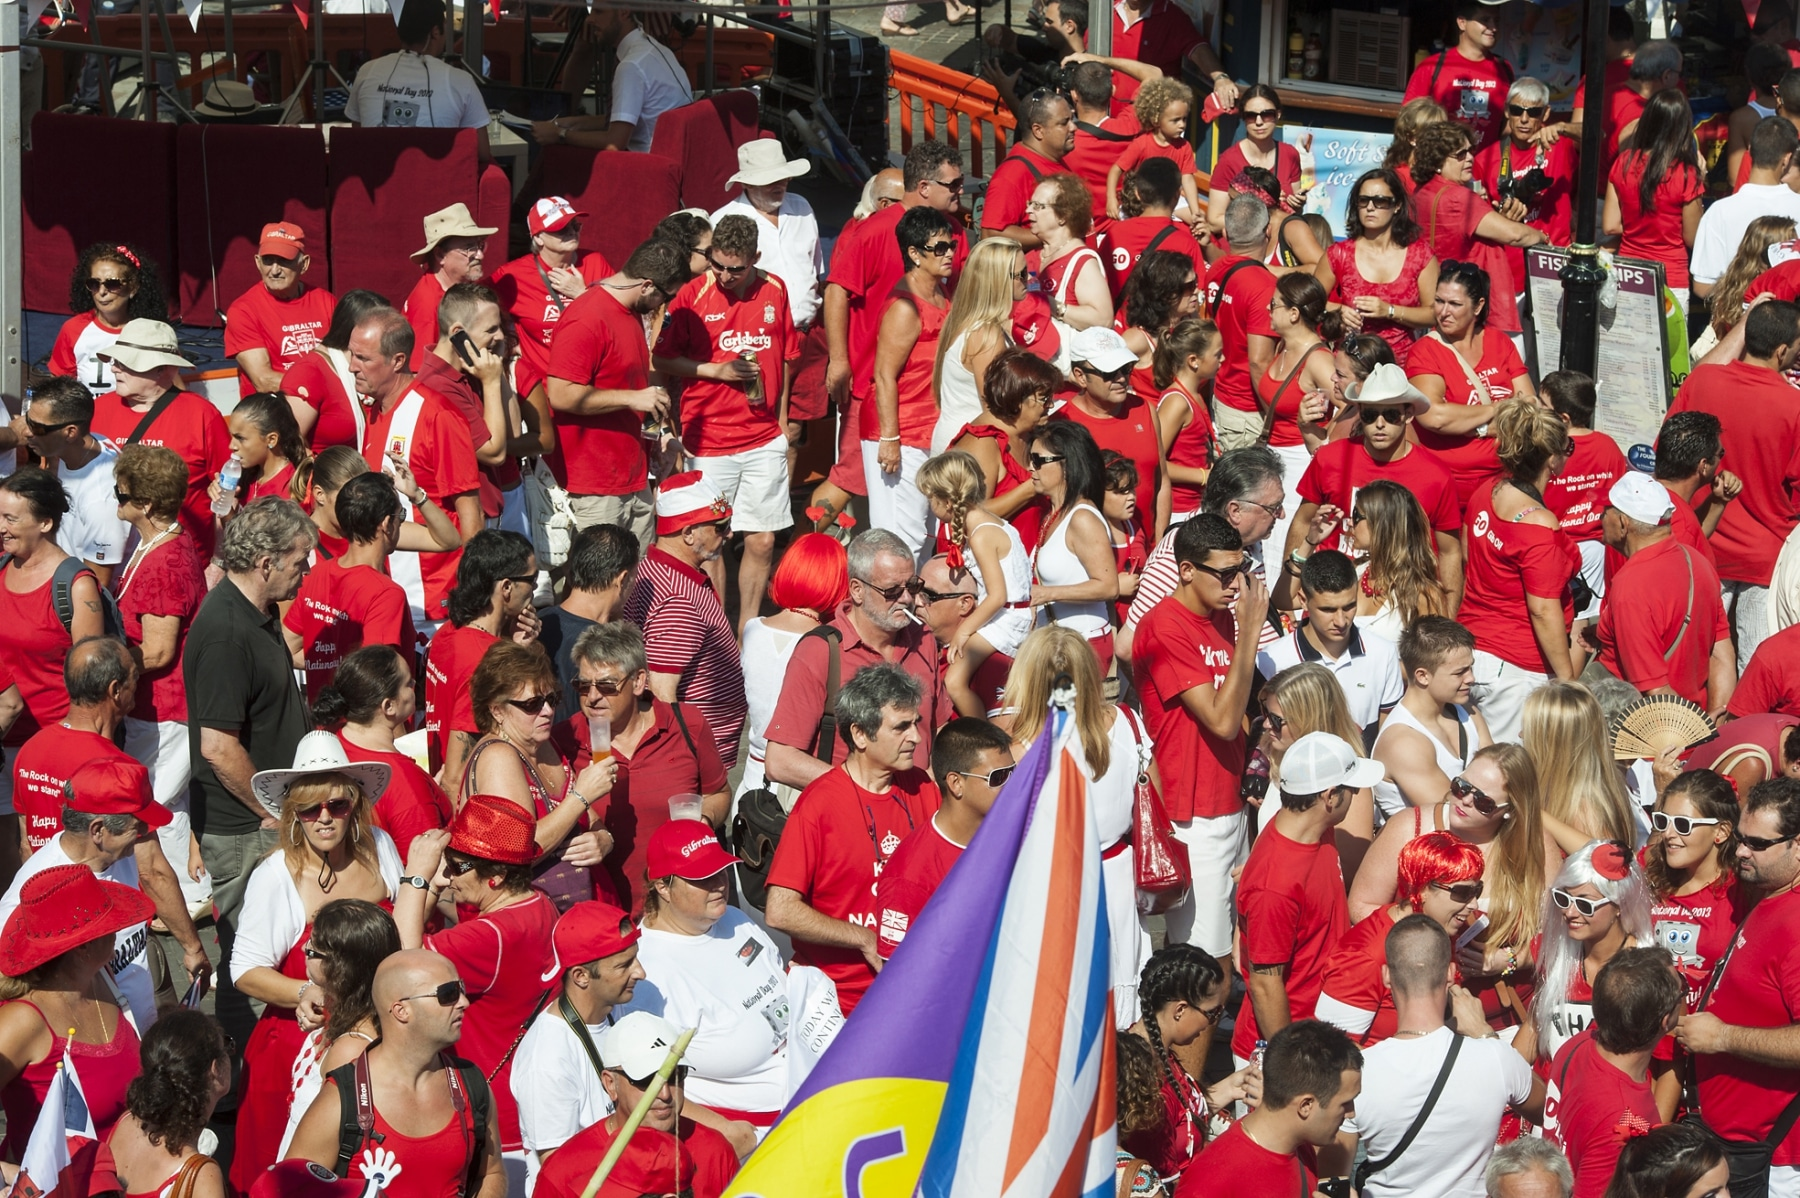 gibraltar-national-day_014_9719764112_o